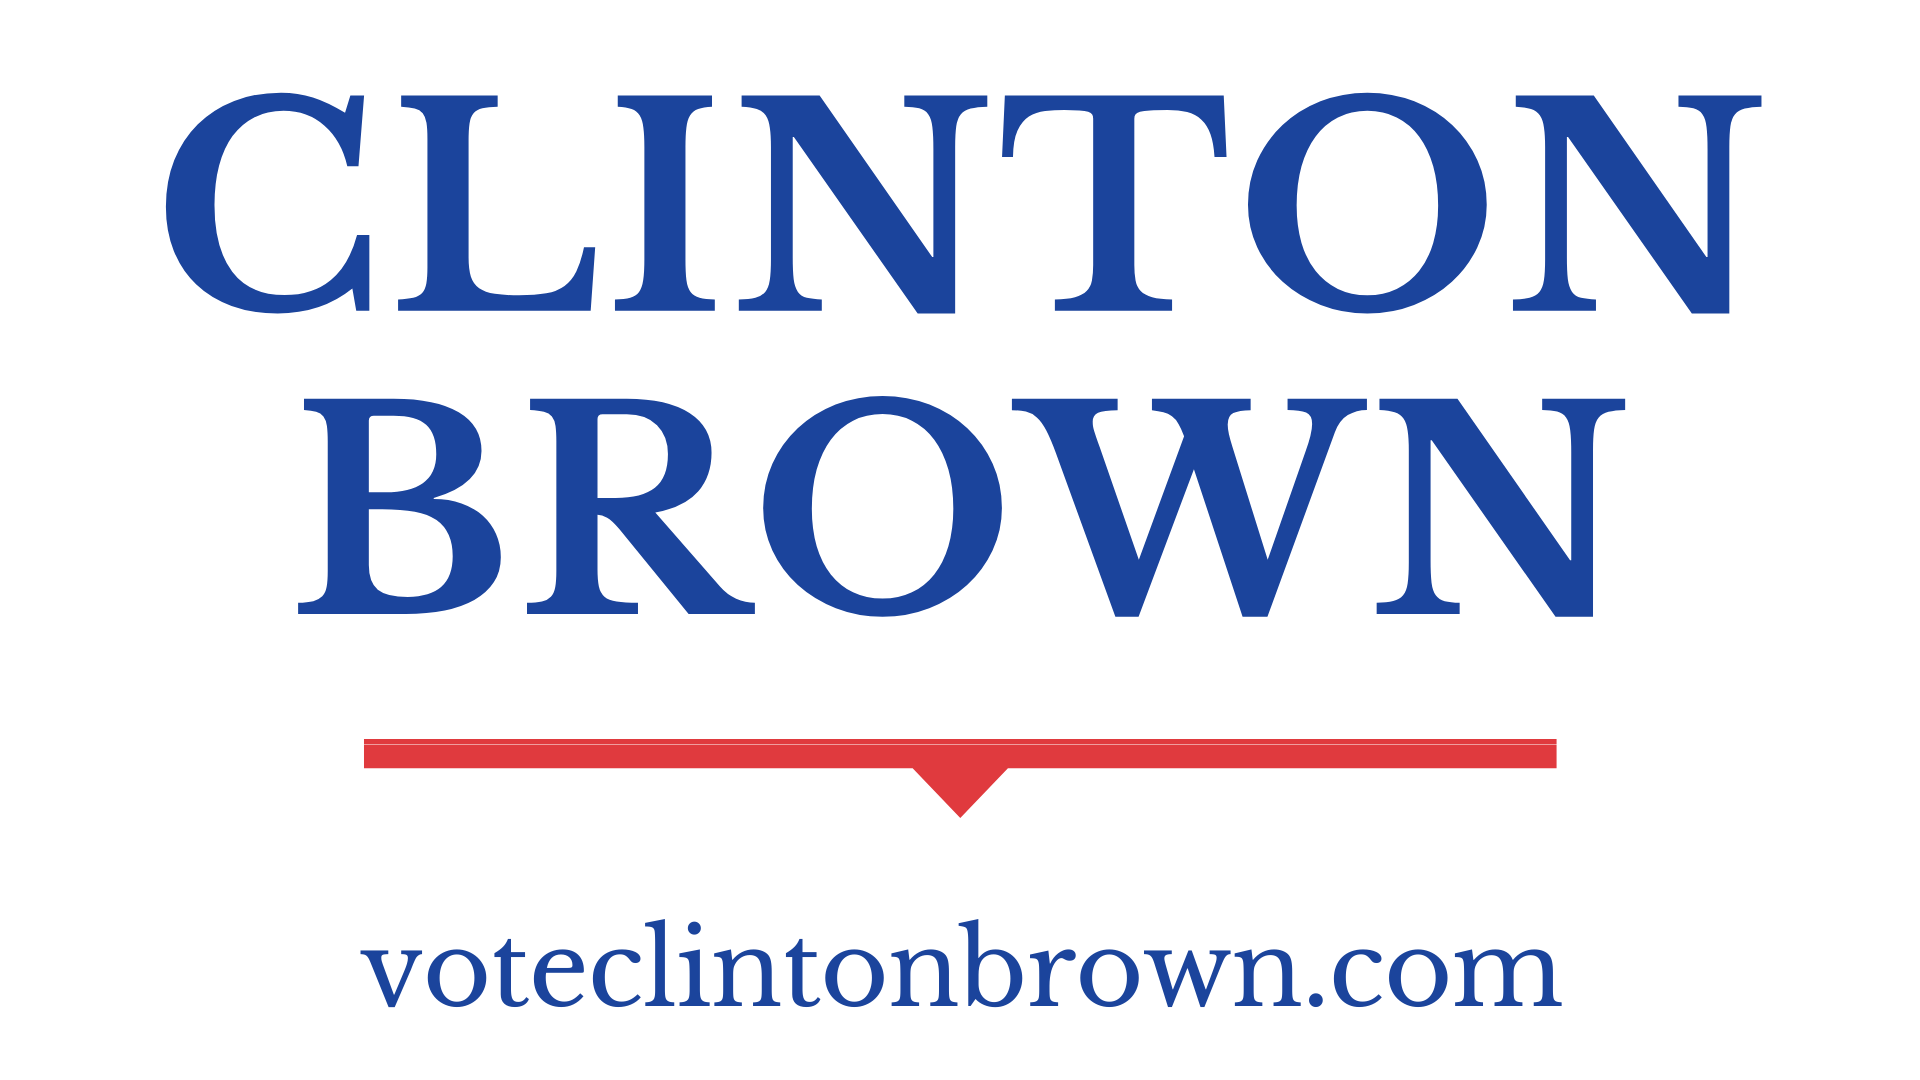 Clinton Brown